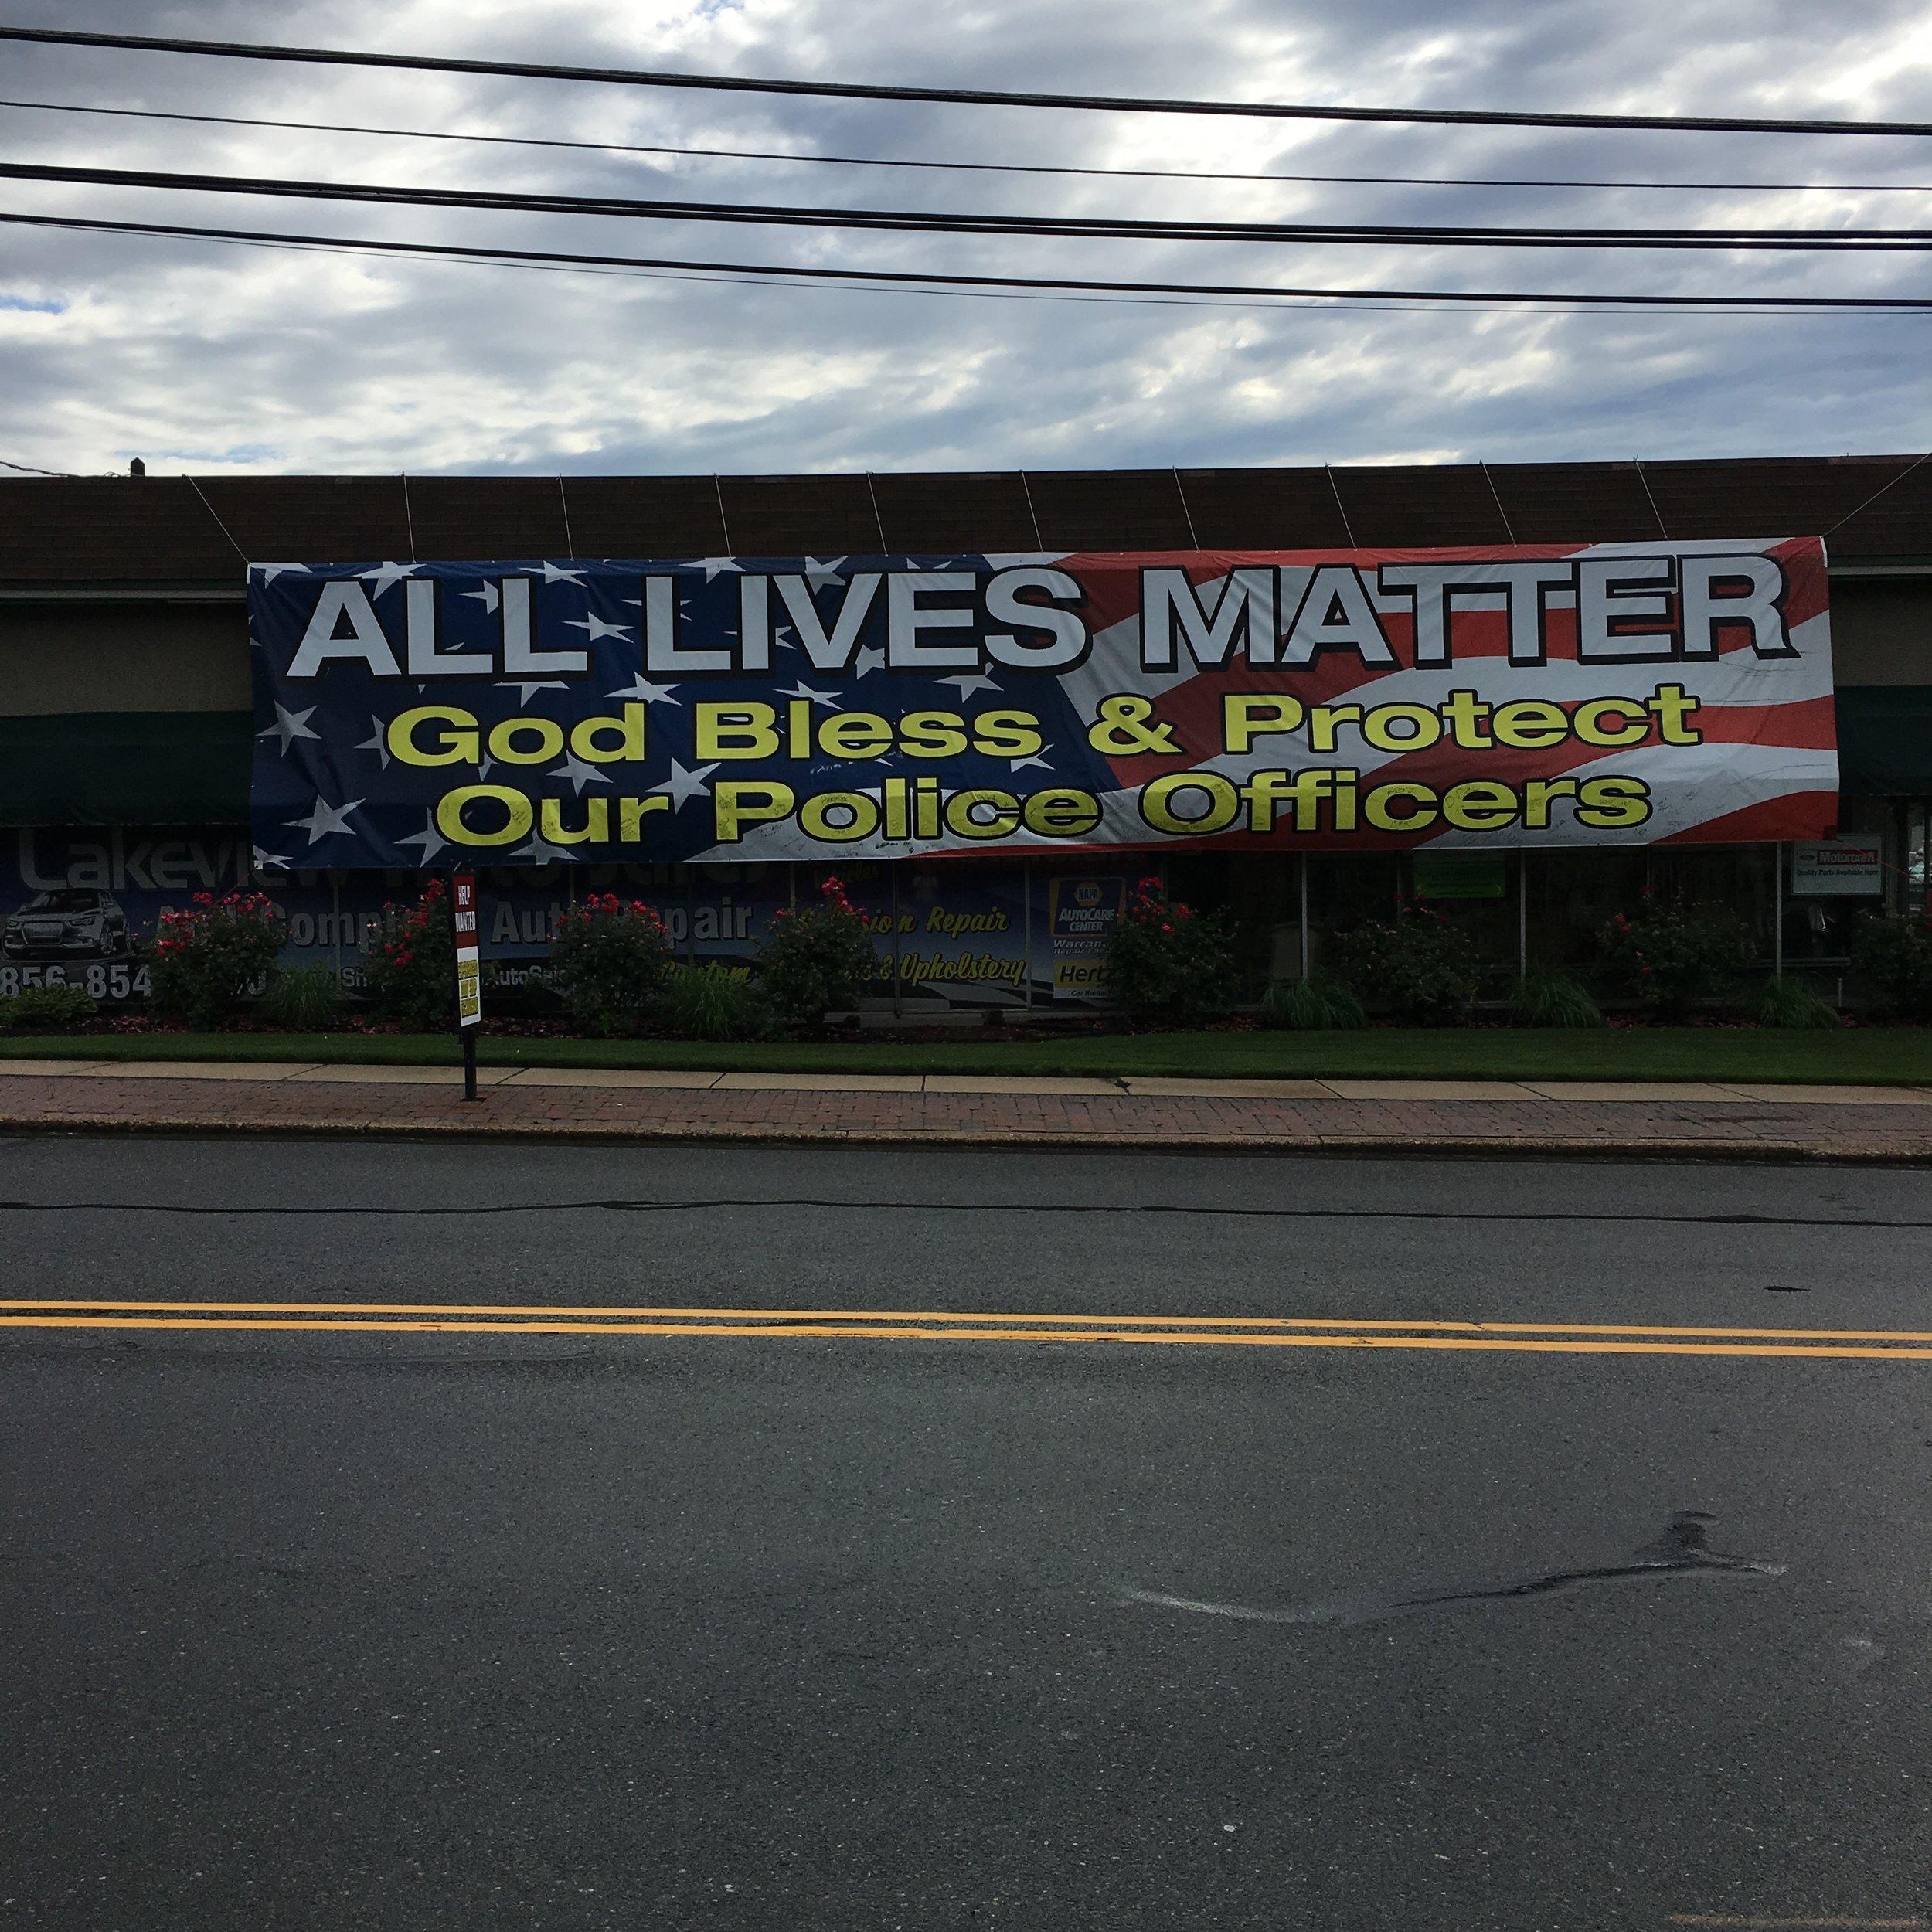 Lakeview Custom Coach, Oaklyn, NJ. Photo credit - me.